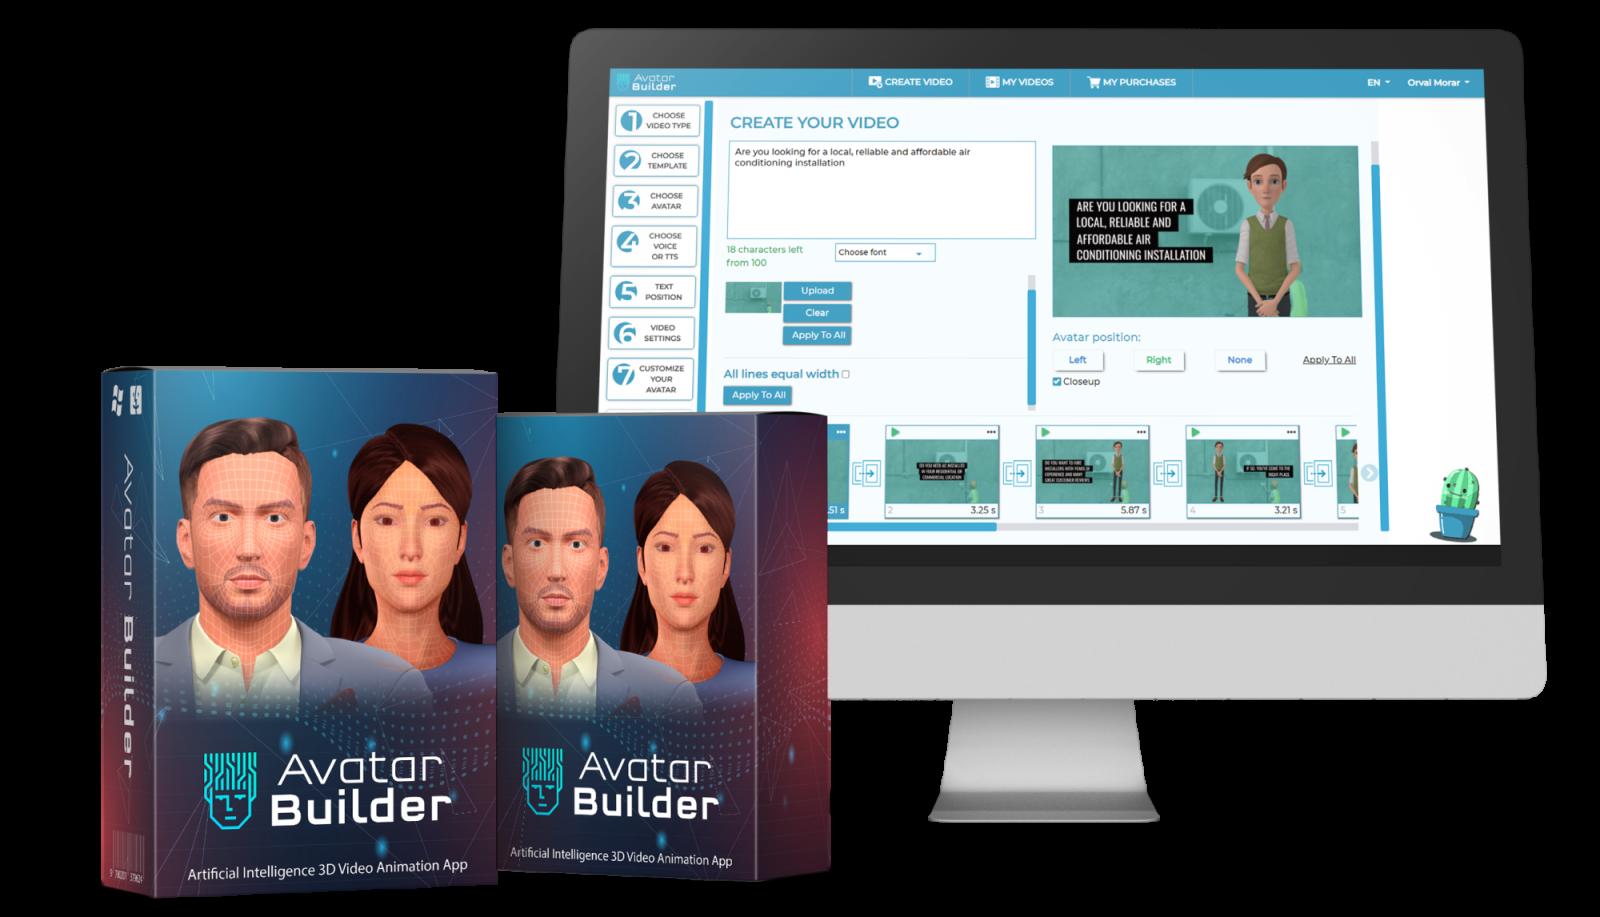 AvatarBuilder Software